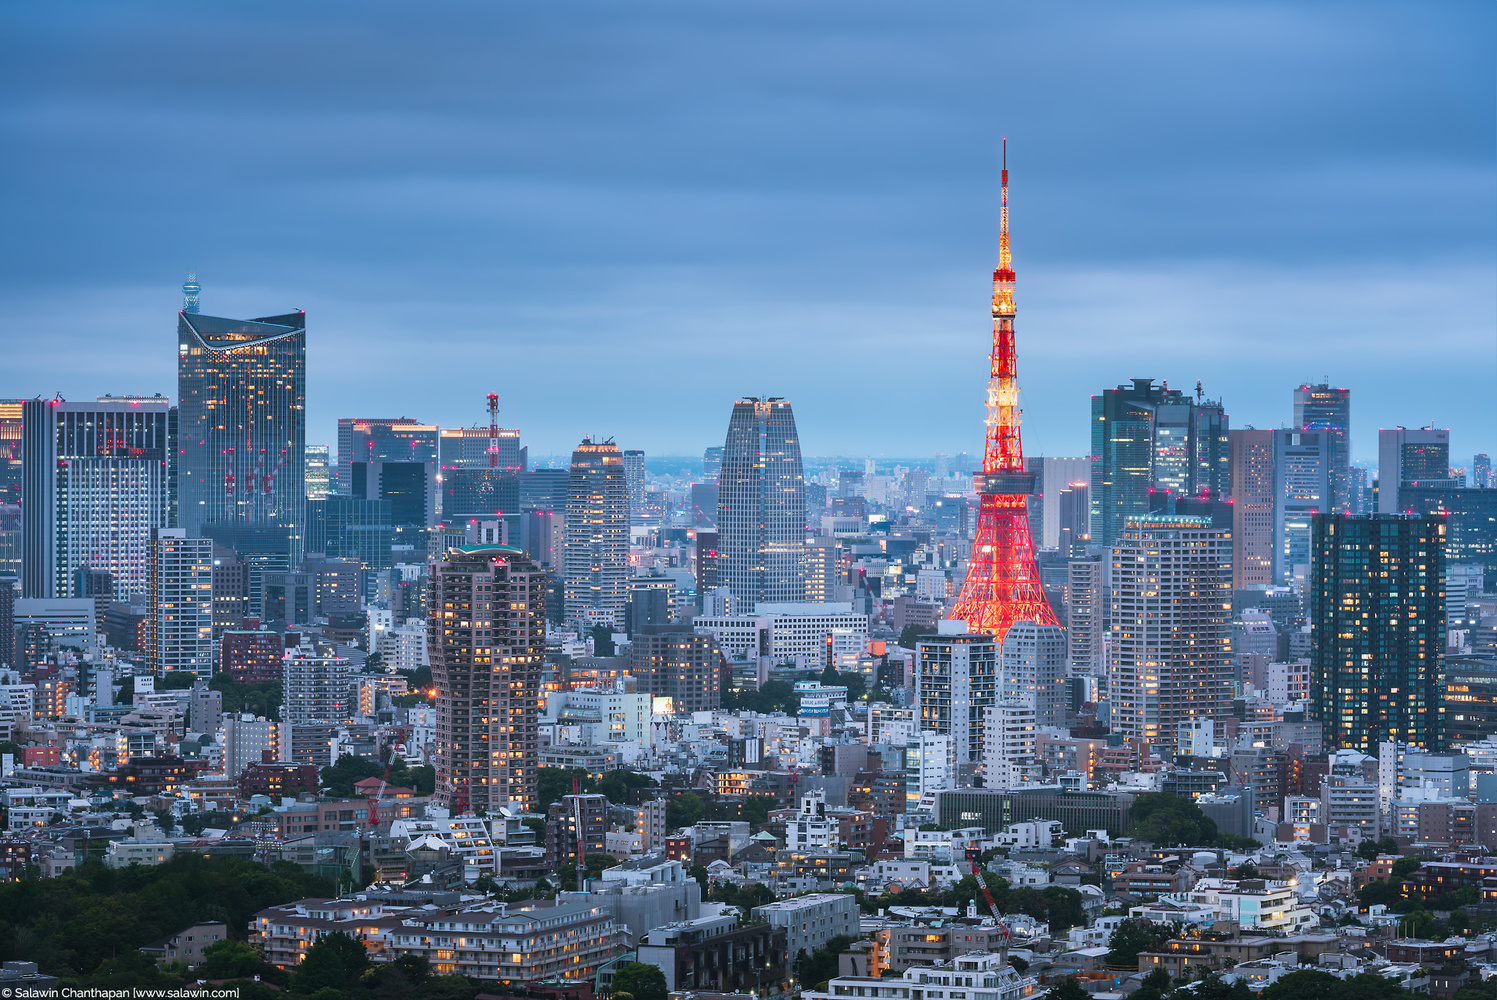 Tokyo Tower and Urban Skyline at dusk by Salawin Chanthapan